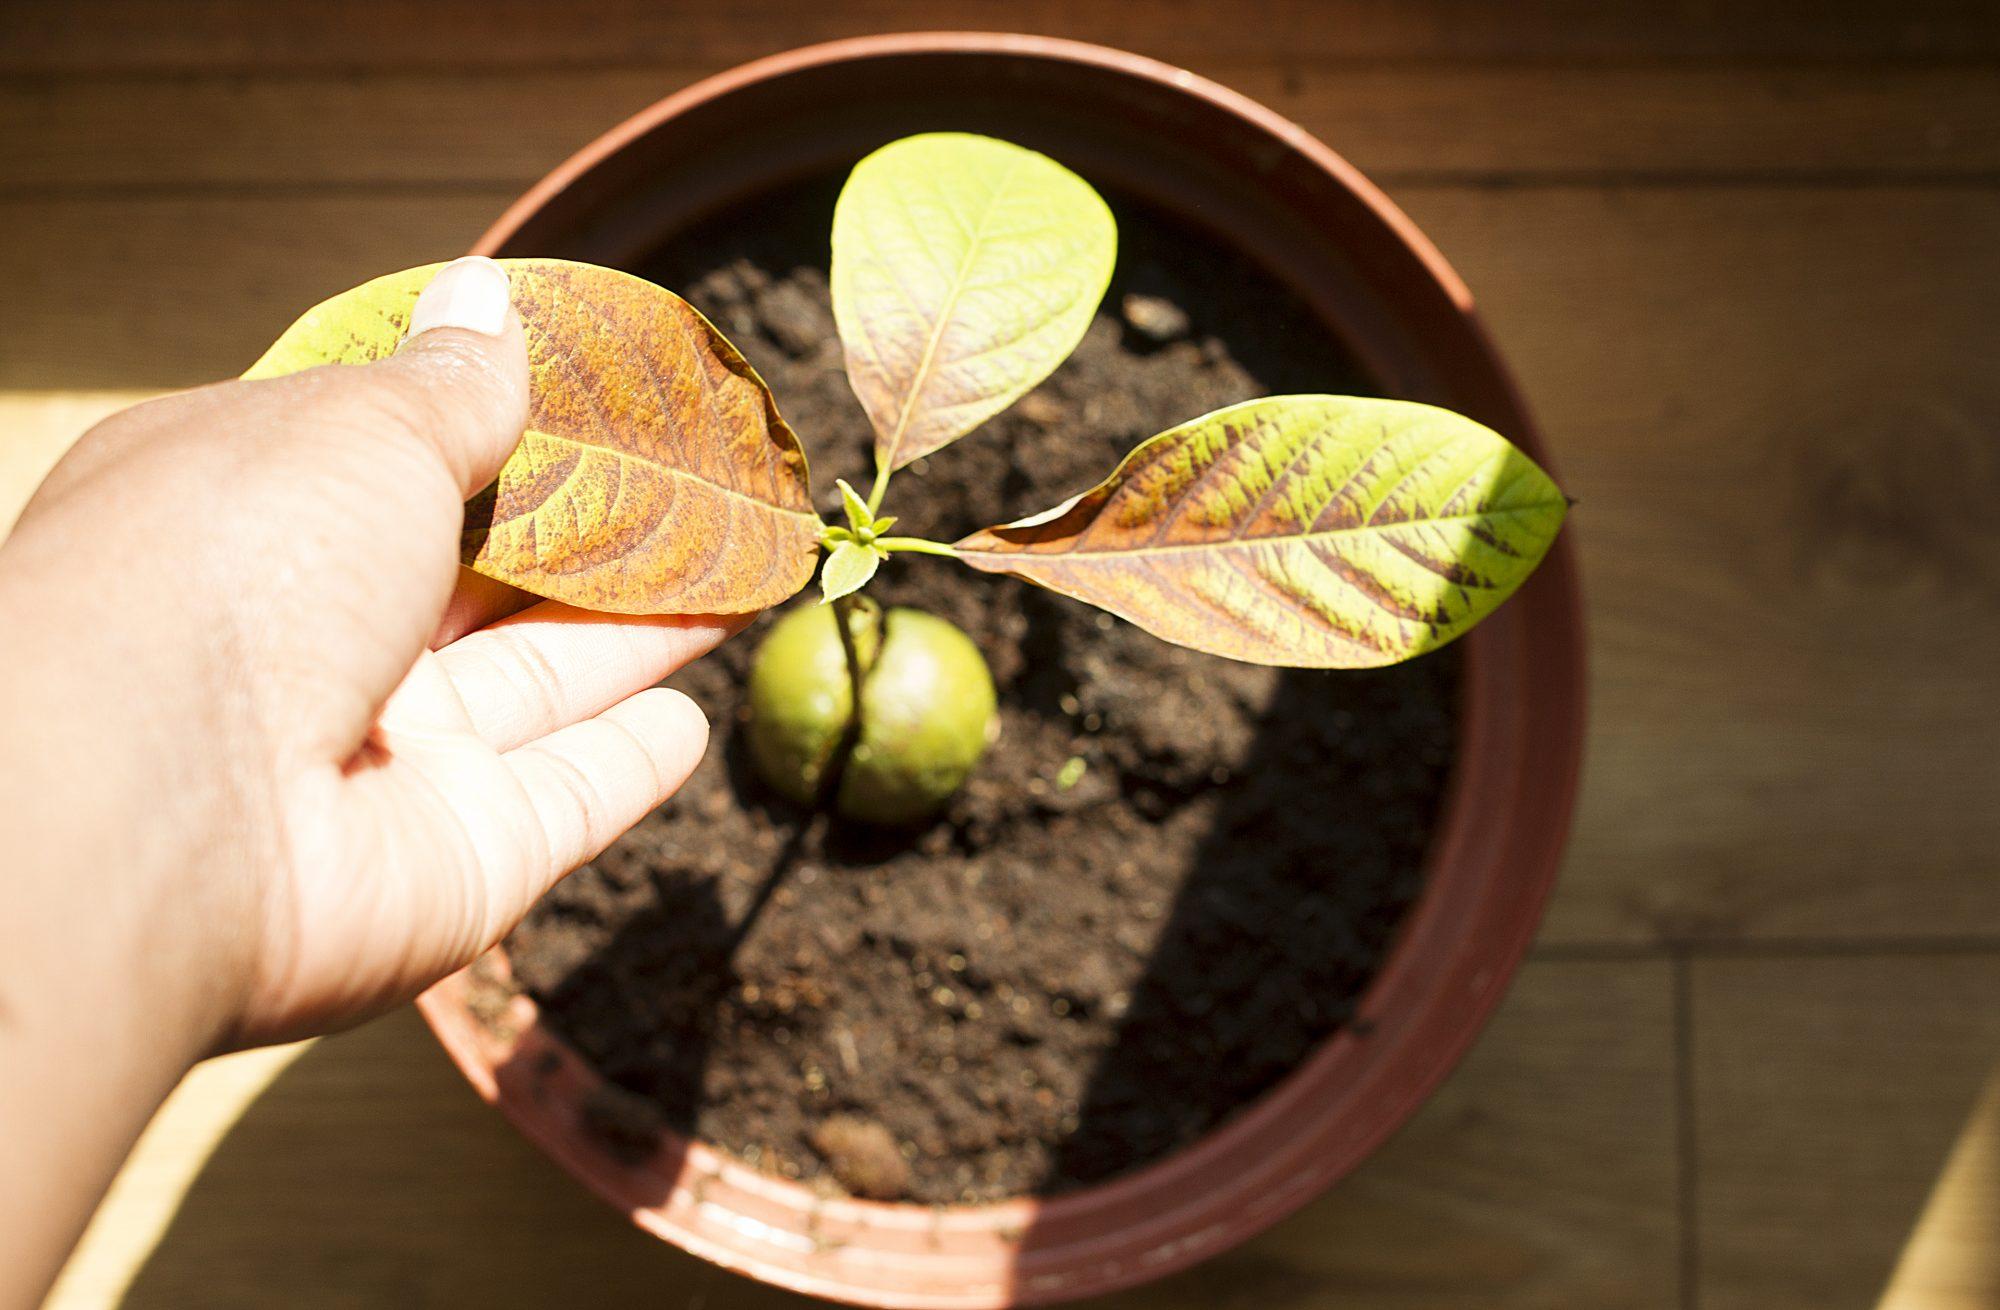 Avocado in pot sunny Getty 7/31/20